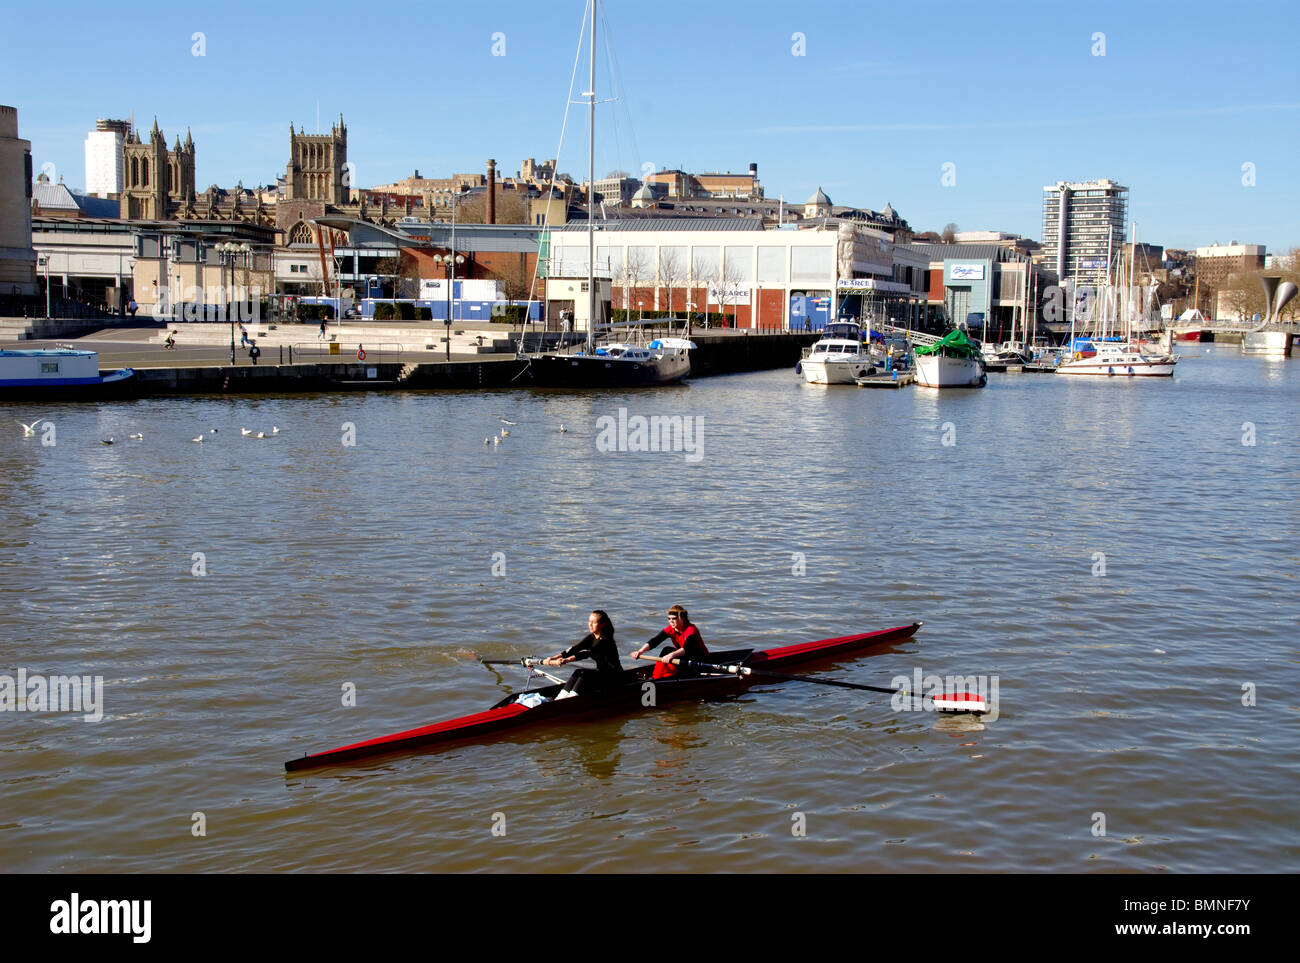 Bristol Docks Area - Stock Image